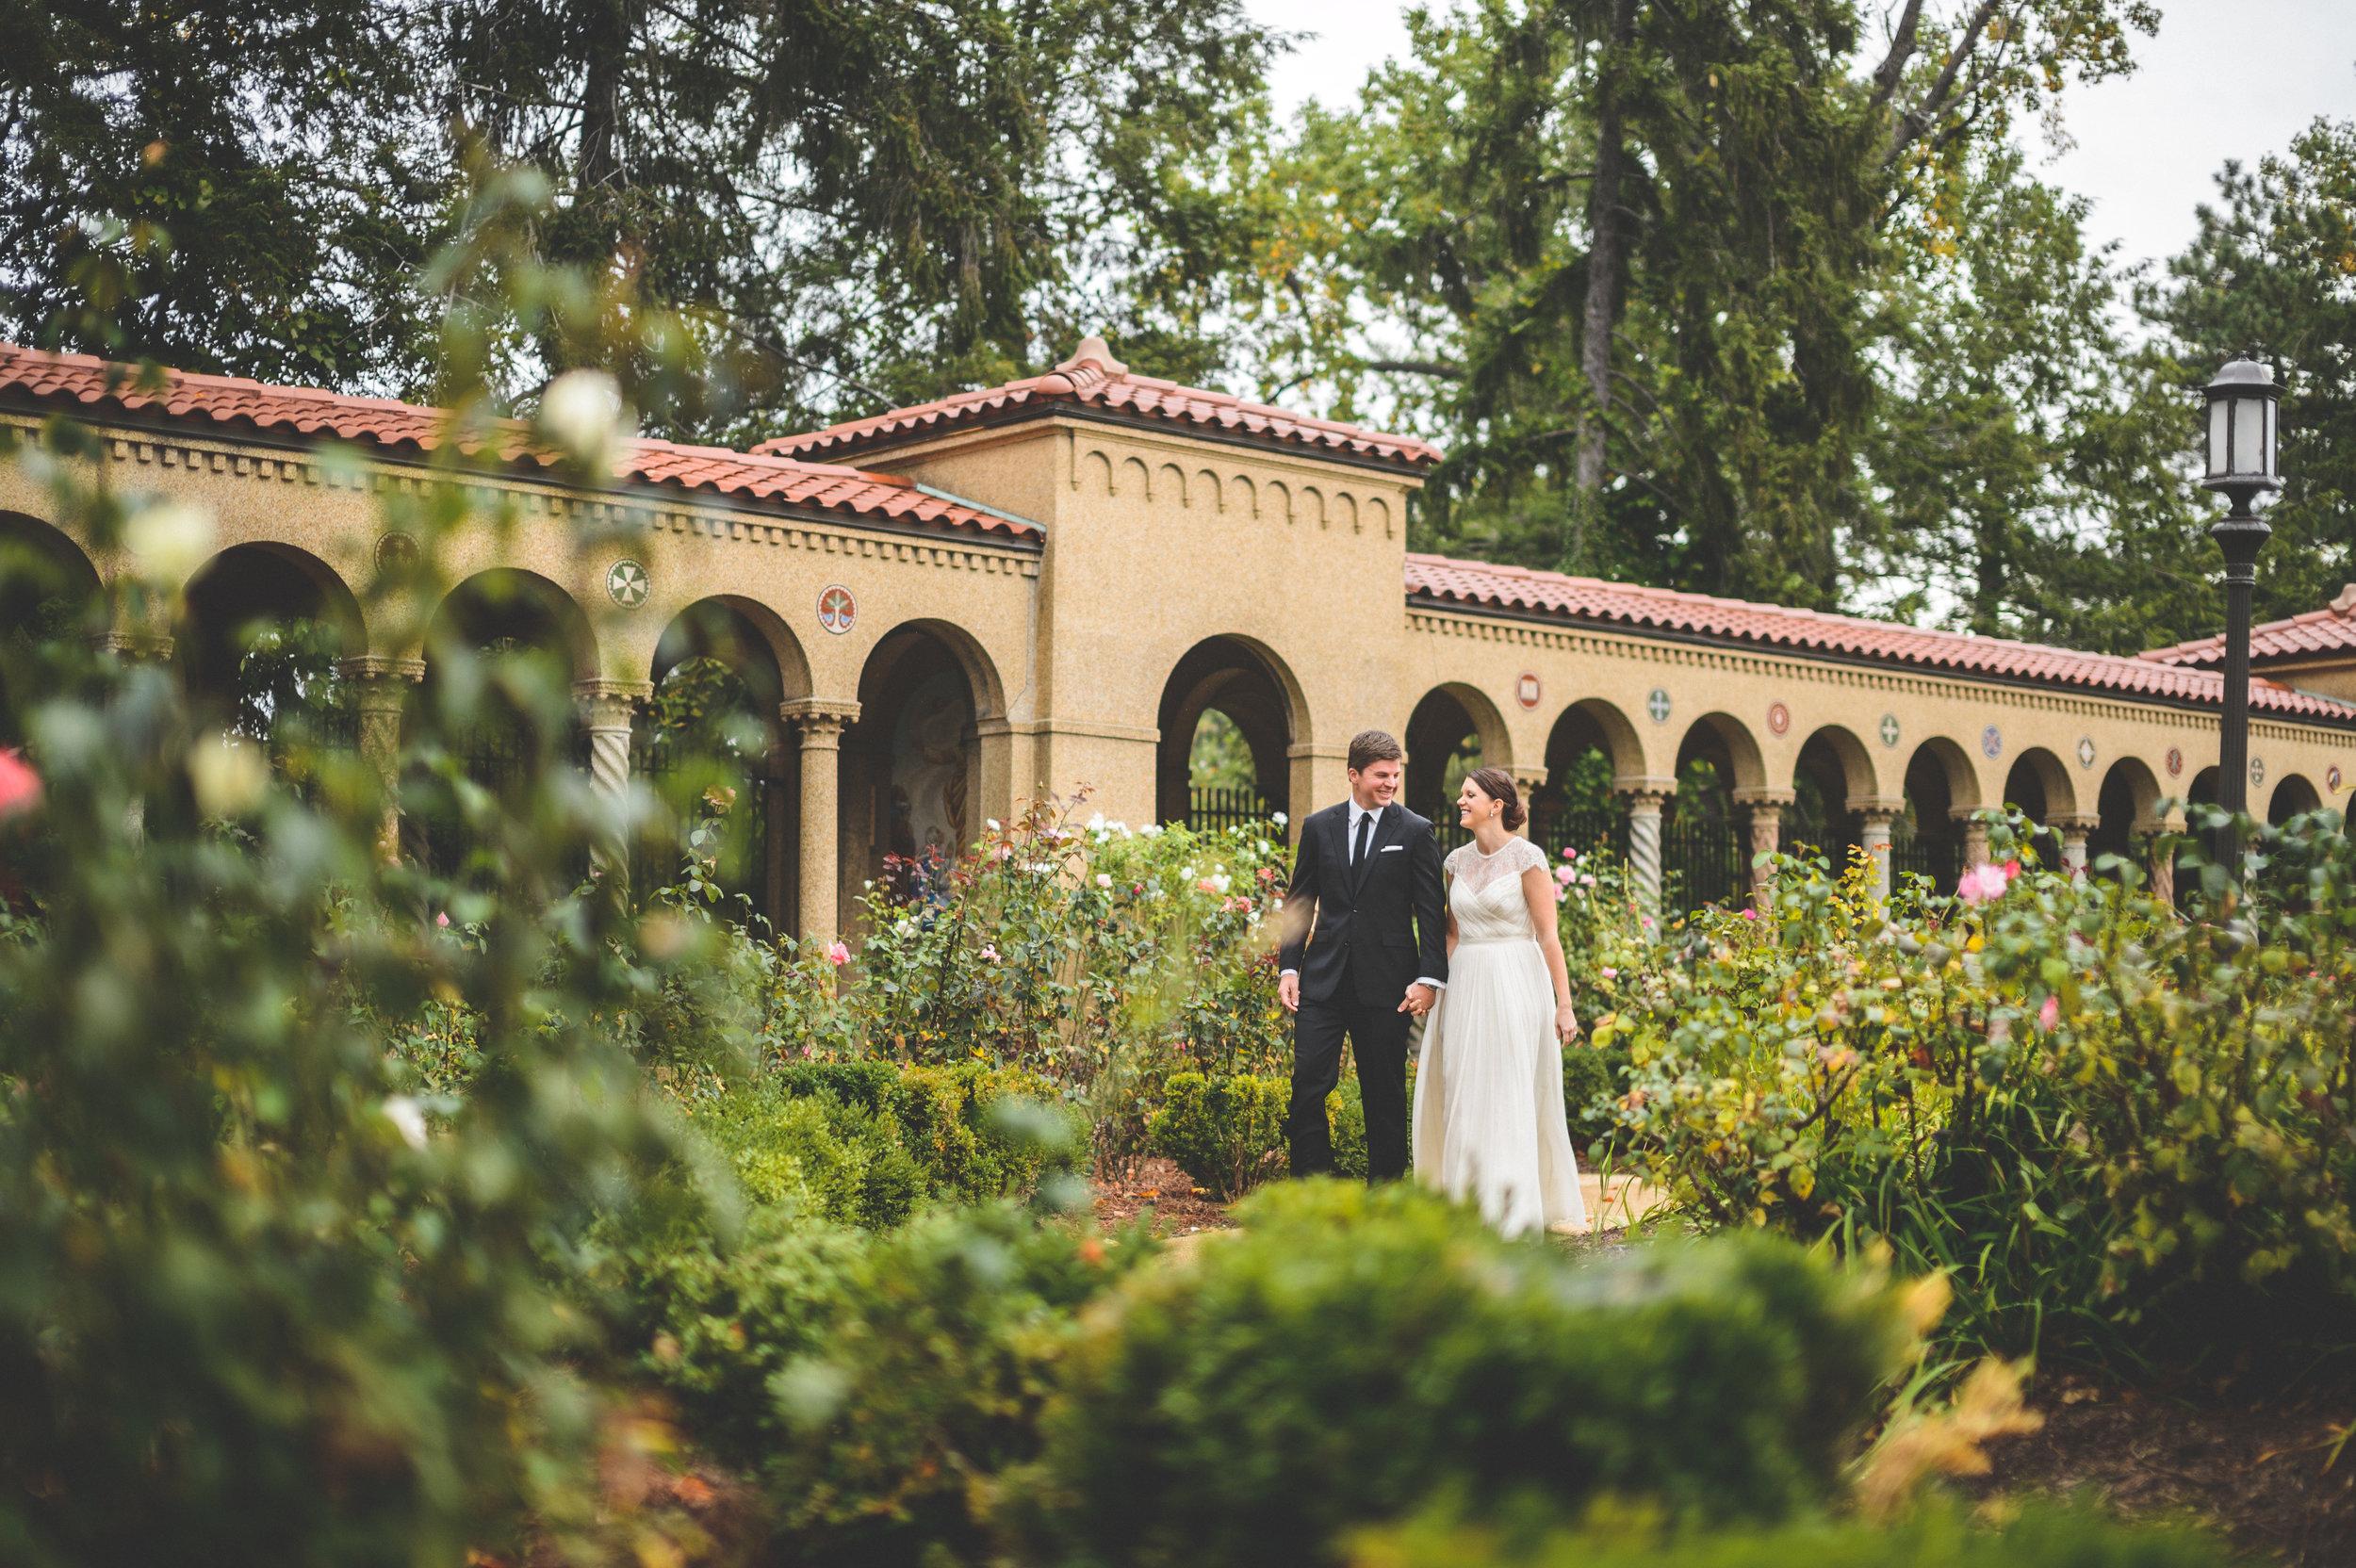 Katie and Ryan wedding franciscan monastery washington dc wedding photographer nathan mitchell-45.jpg